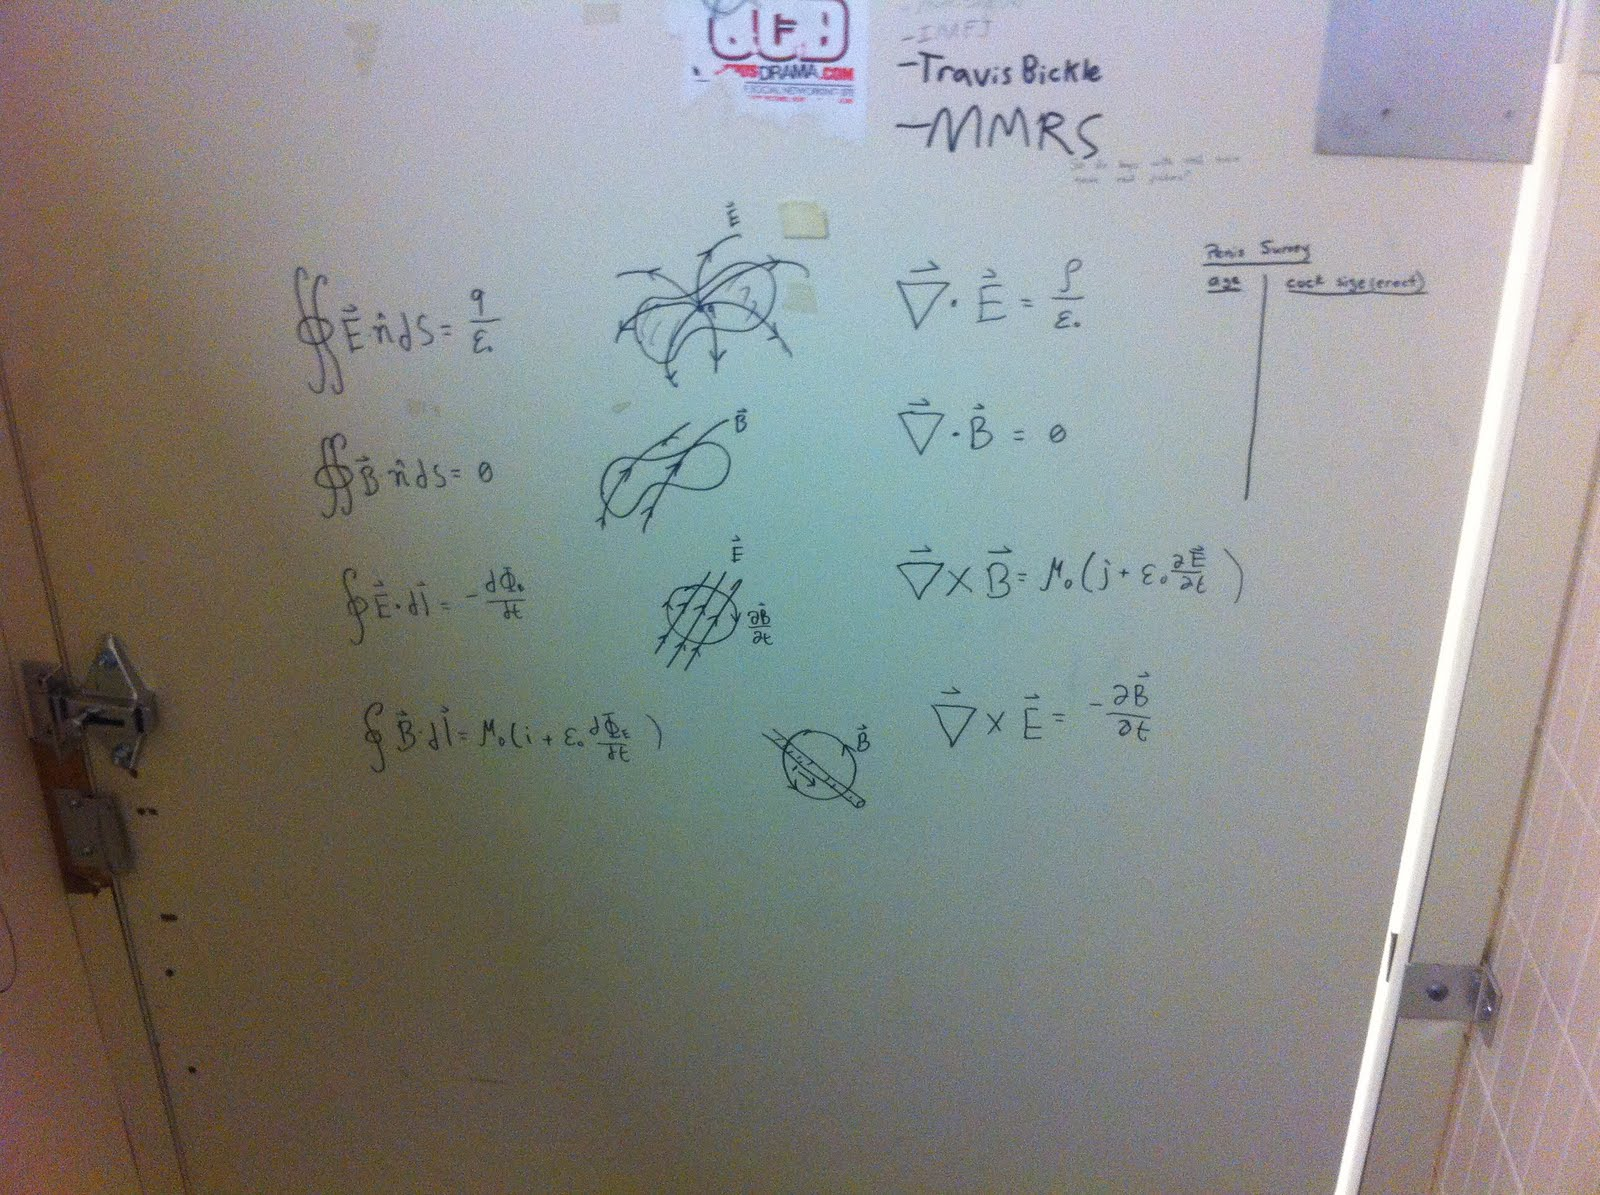 2011 Bathroom Stall Graffiti At The Math And Physics Building